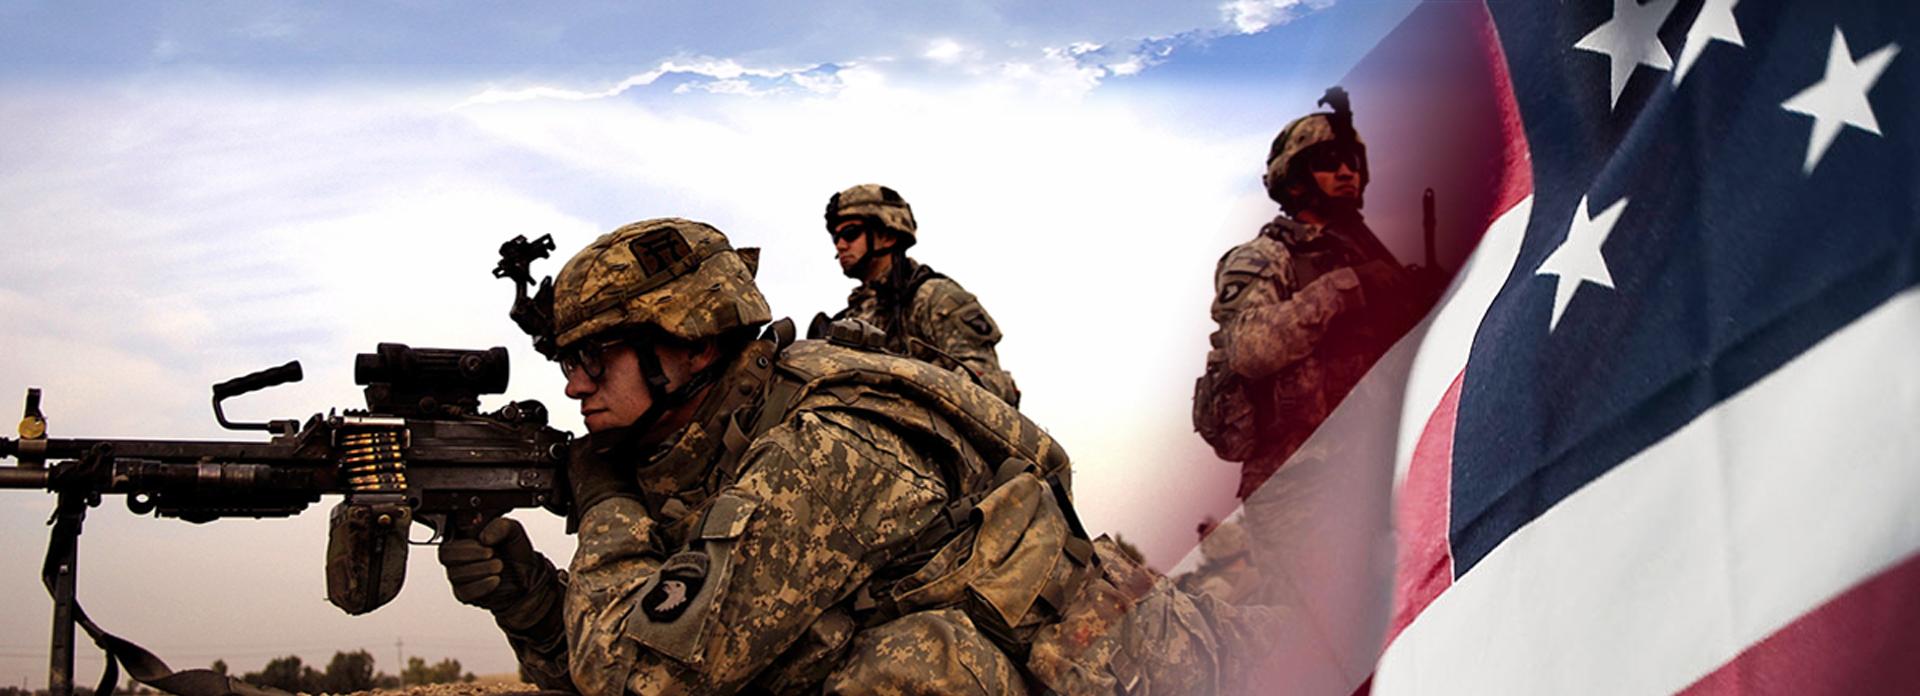 Army @The American Veteran